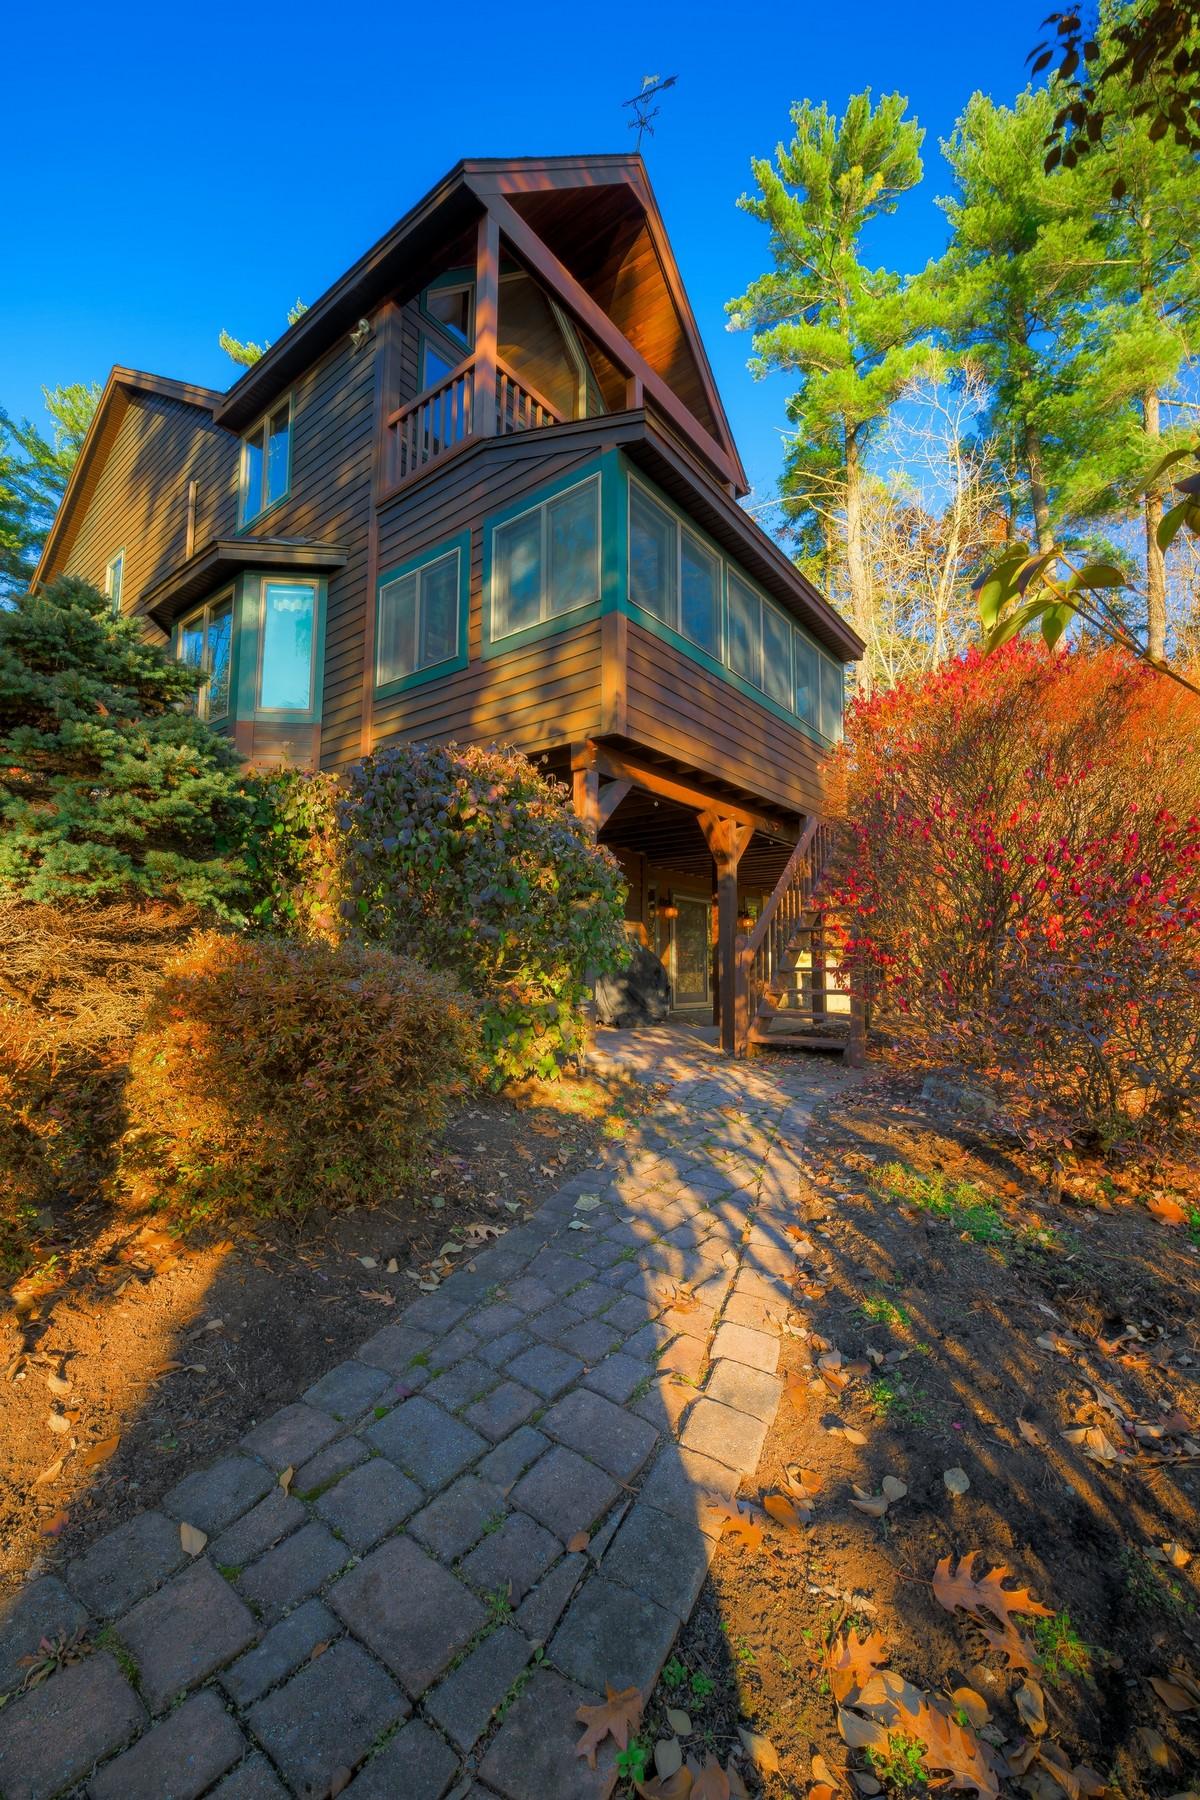 Additional photo for property listing at Lake George Waterfront 69  Vandecar La 乔治湖, 纽约州 12845 美国